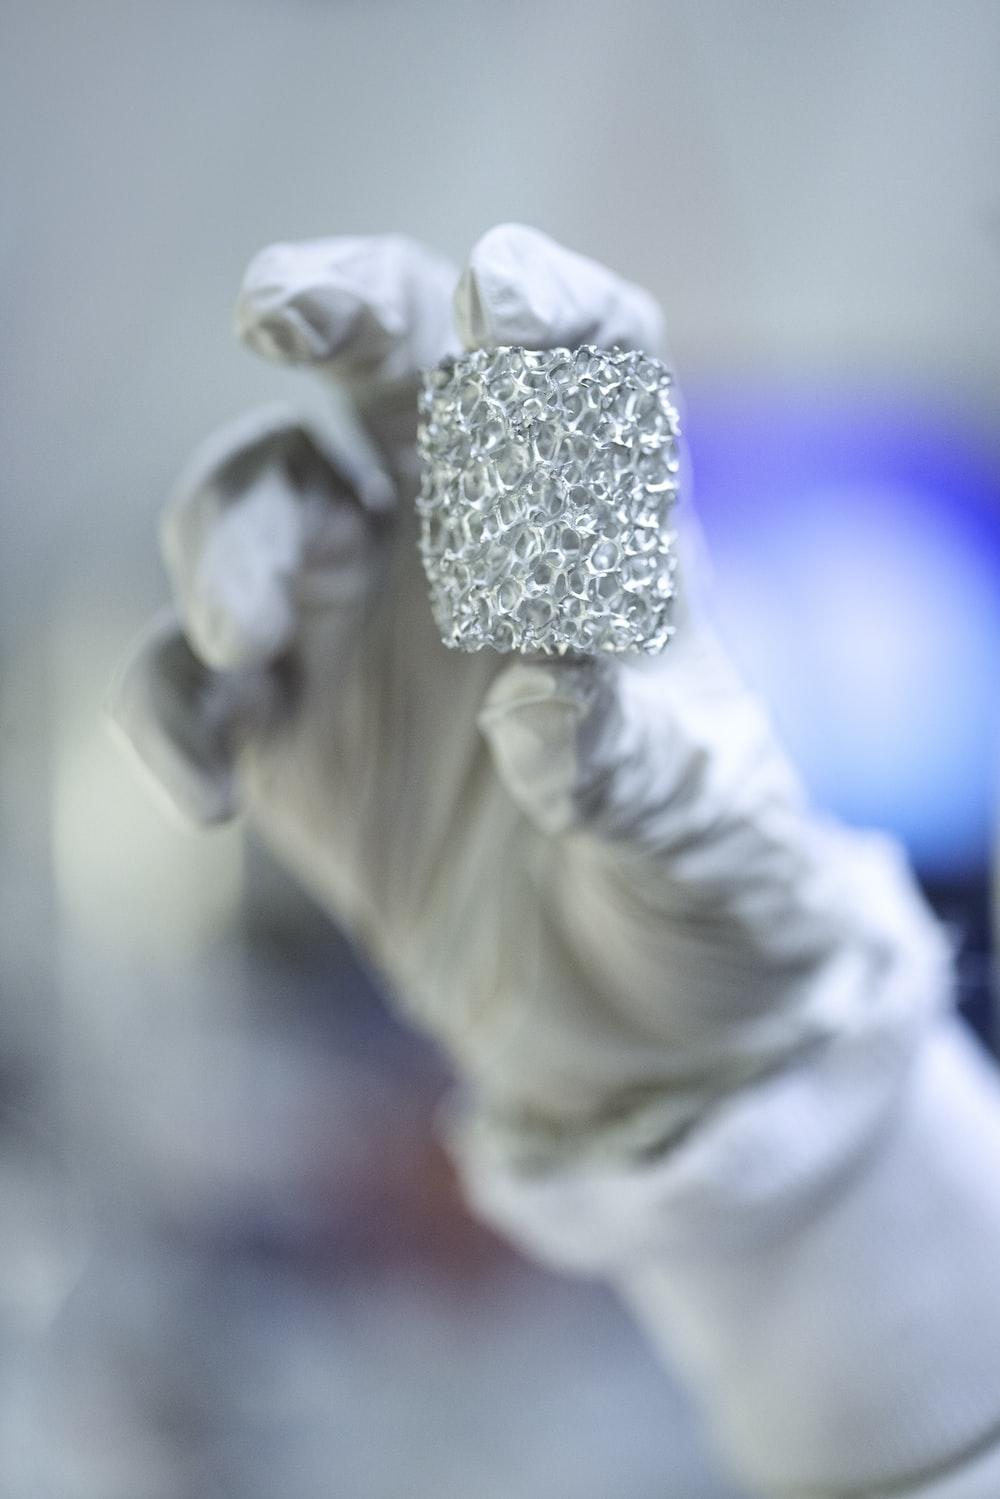 silver diamond studded ring in white flower